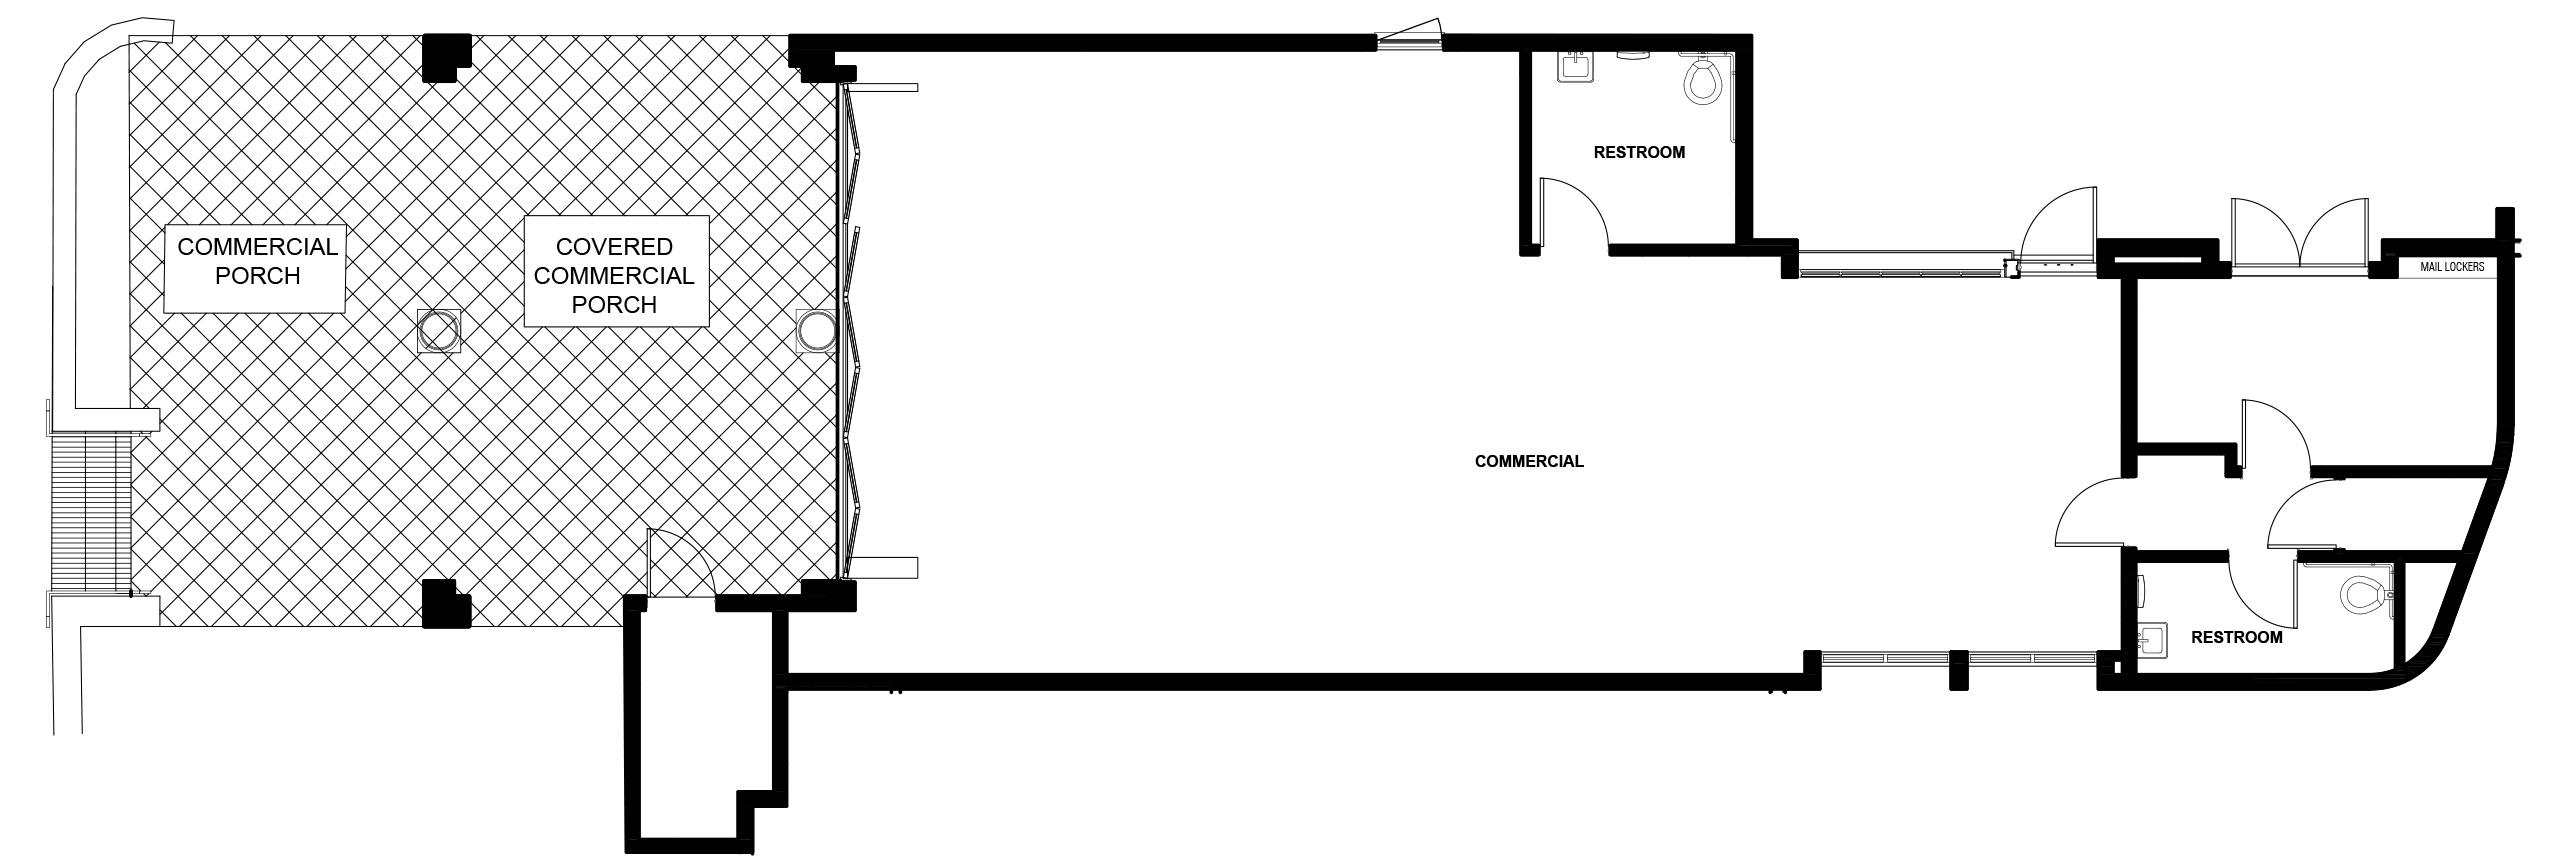 Commercial Space floor plan